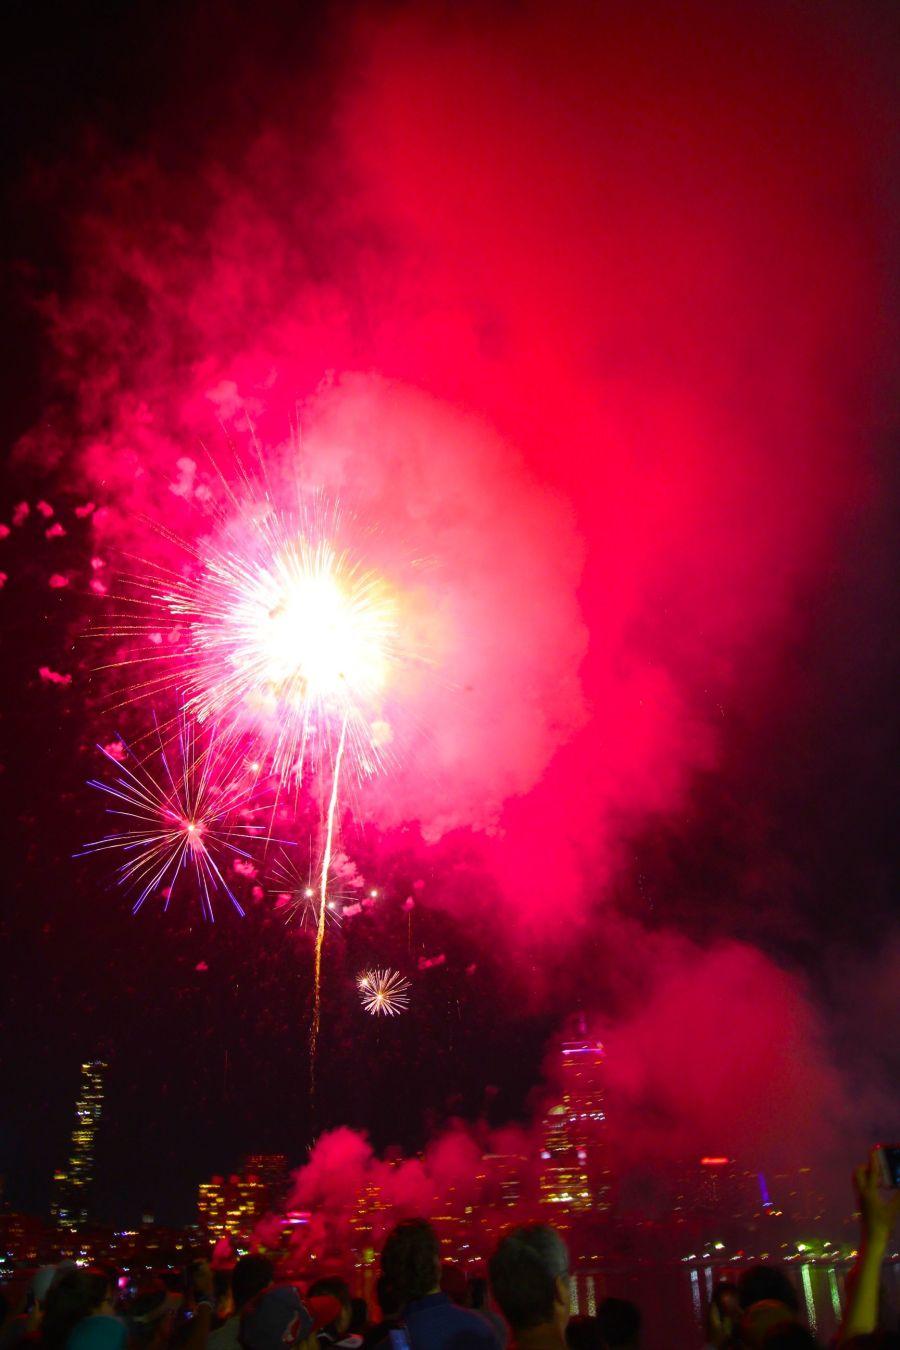 cambridge charles river fireworks 18